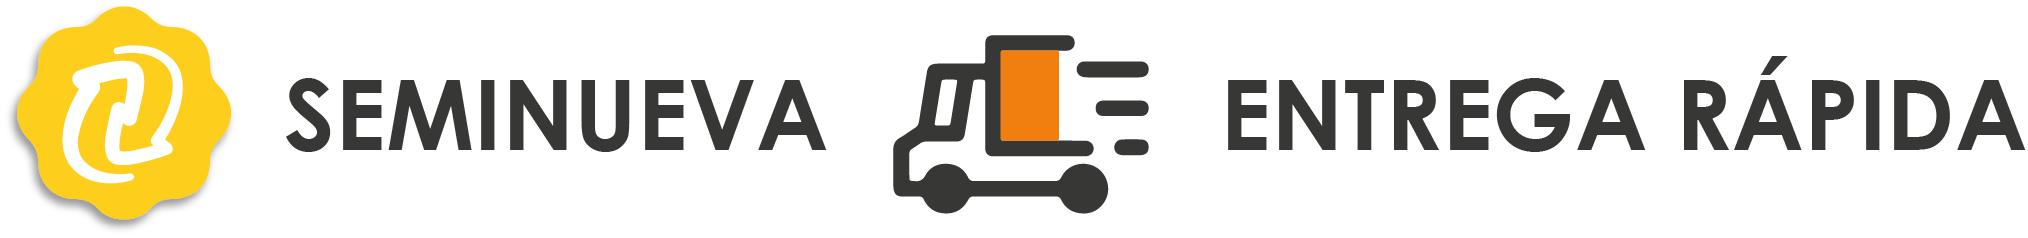 maquina expendedora seminueva de entrega rapida